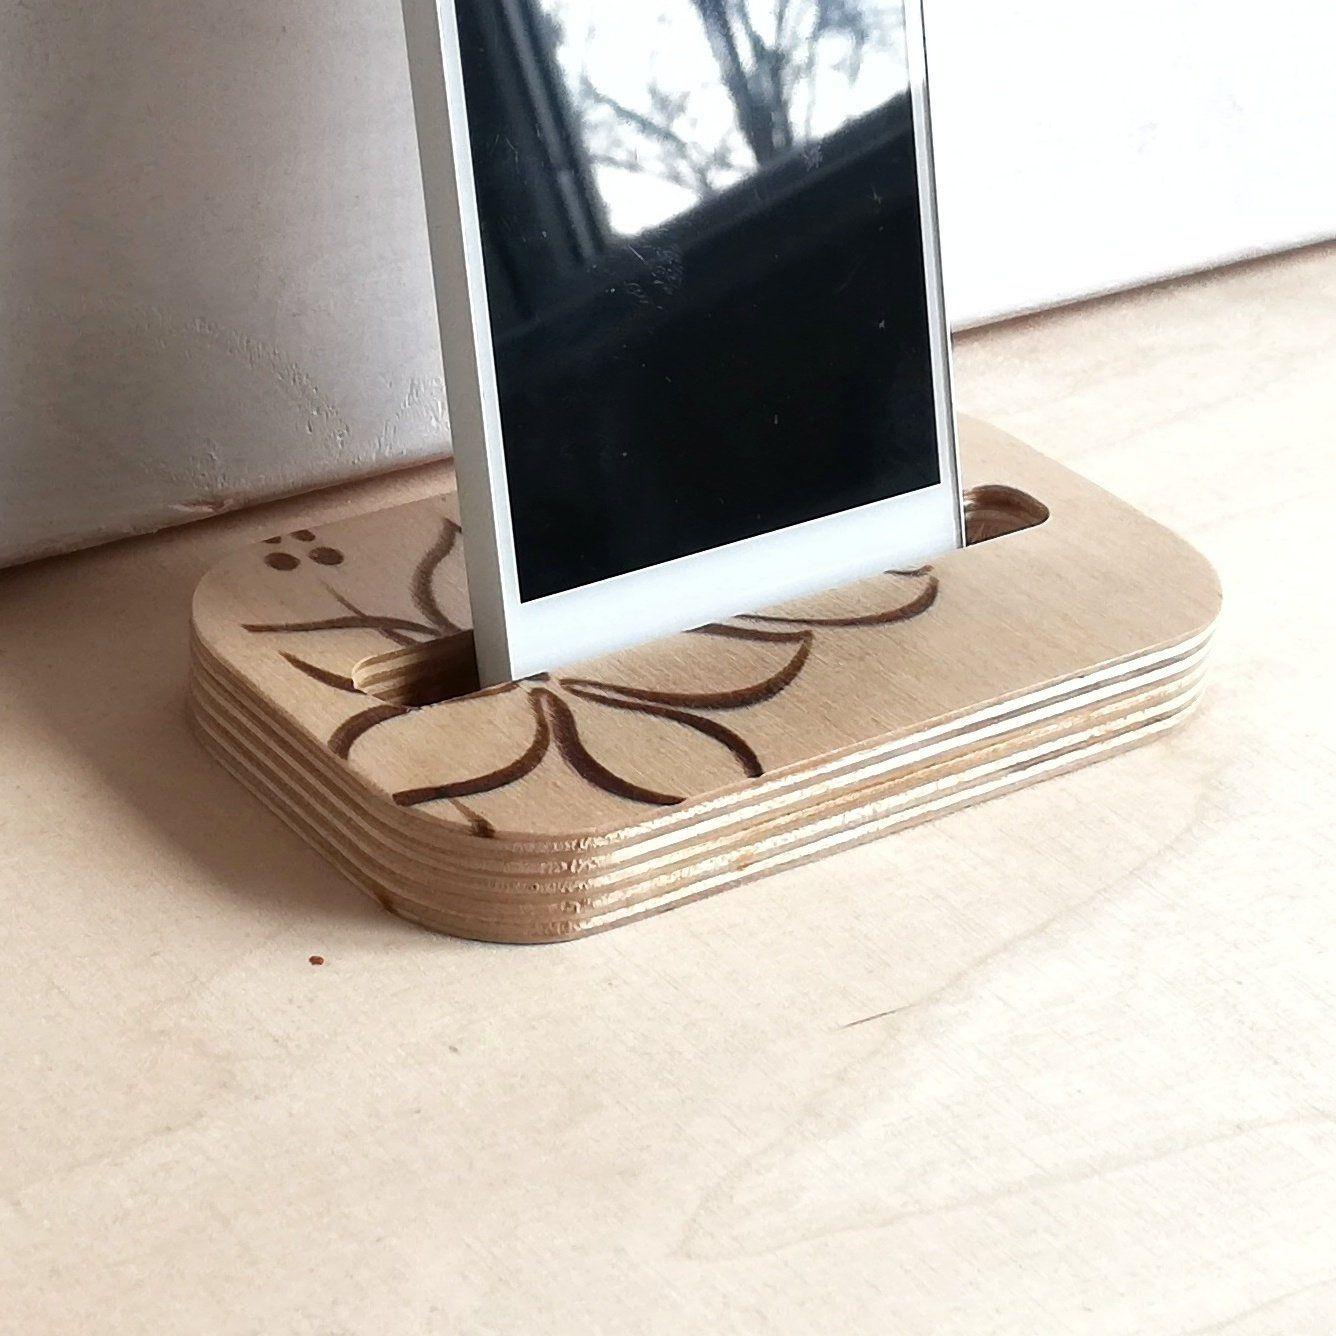 Wooden Multi Device Organizer Charging Station Dock Holder